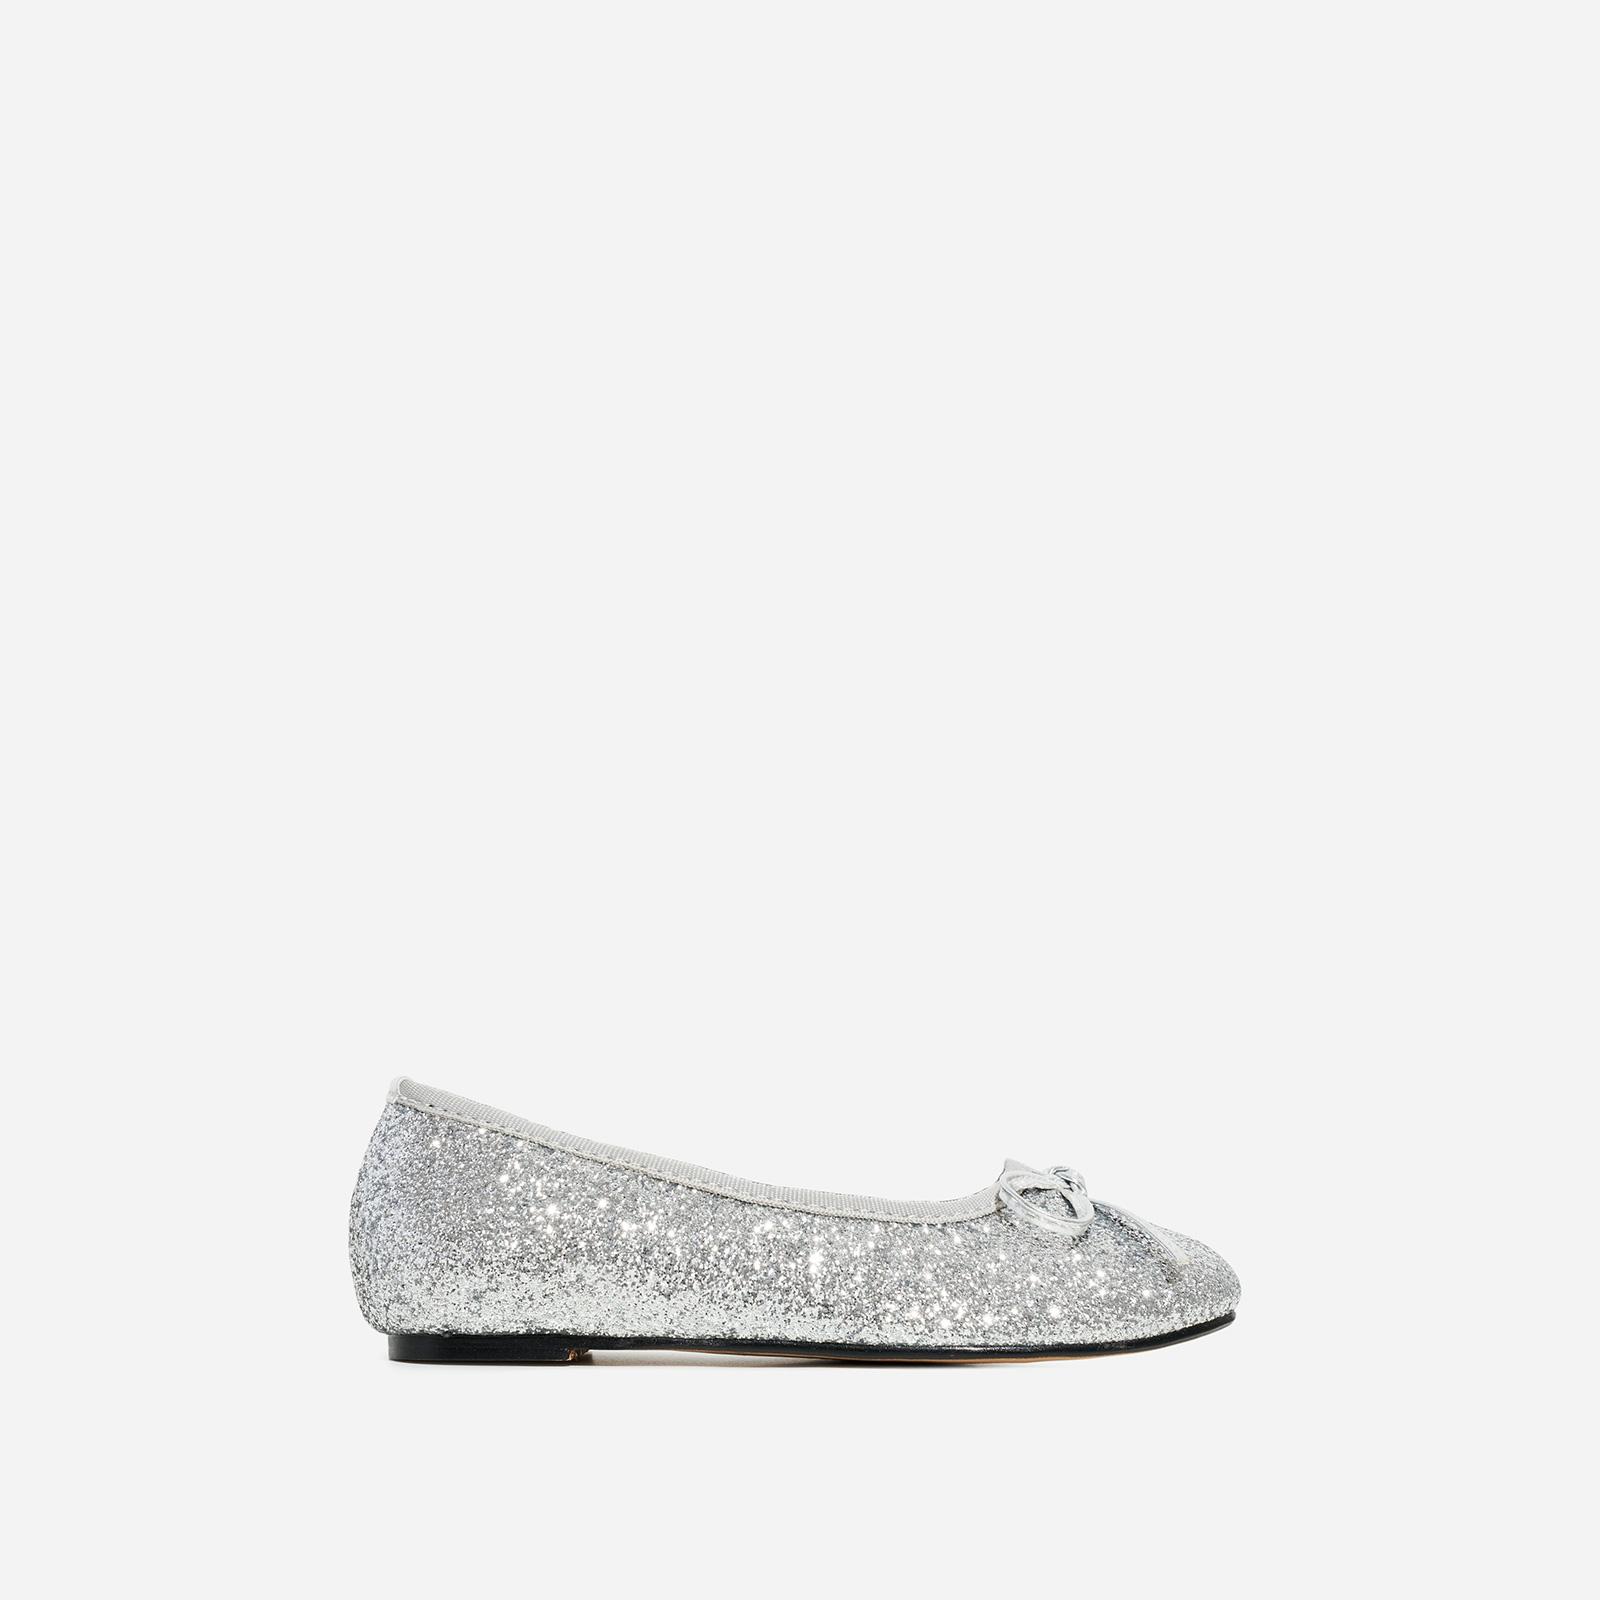 Ballerina Girl's Bow Detail Flat Ballet Pump In Silver Glitter